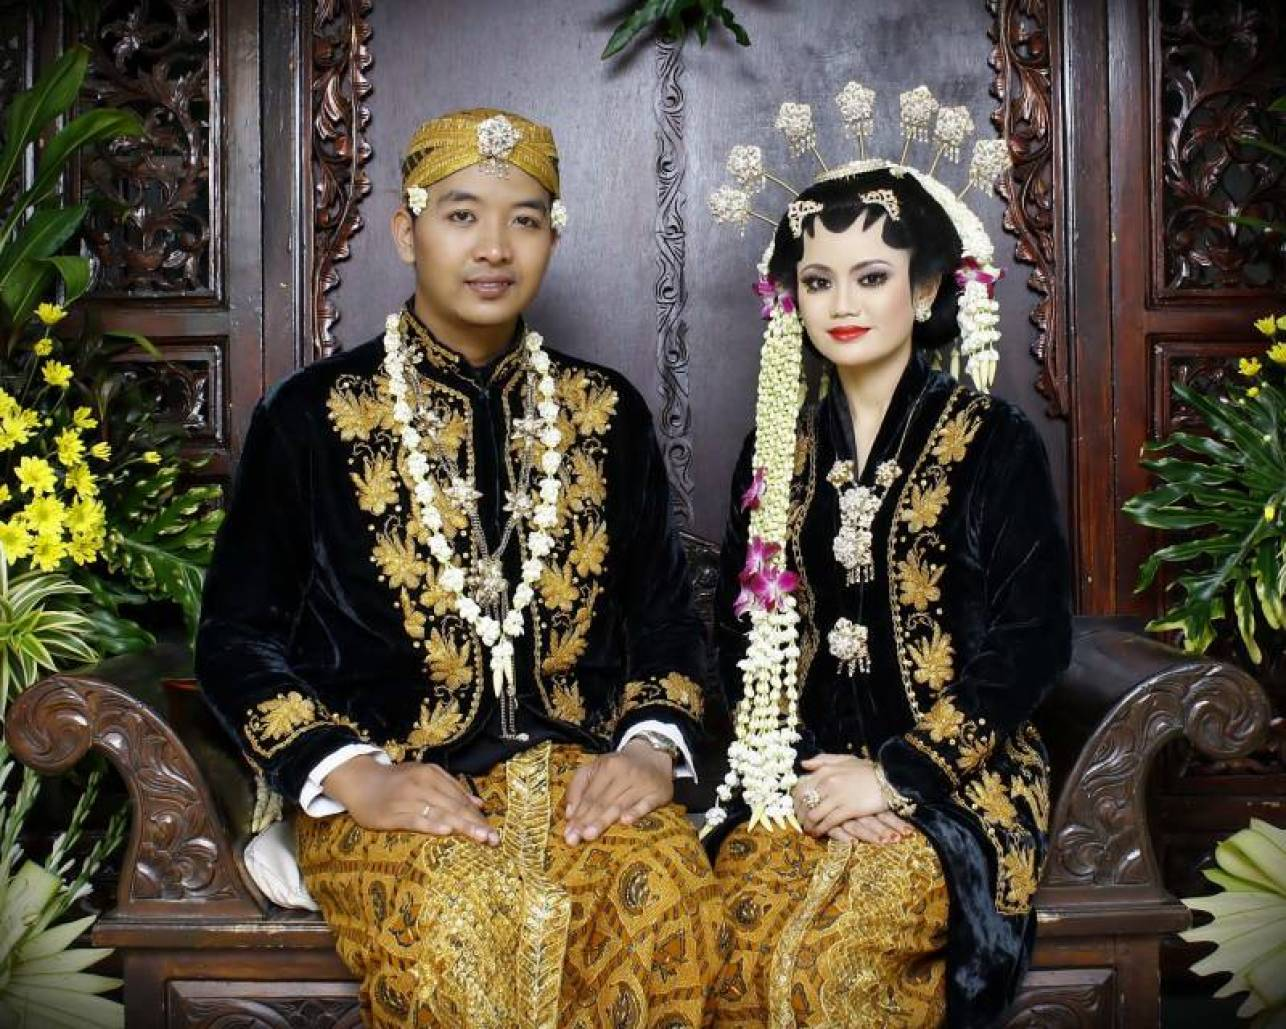 LENGKAP] Daftar 10 Pakaian Adat Jawa Timur Beserta Aksesorisnya